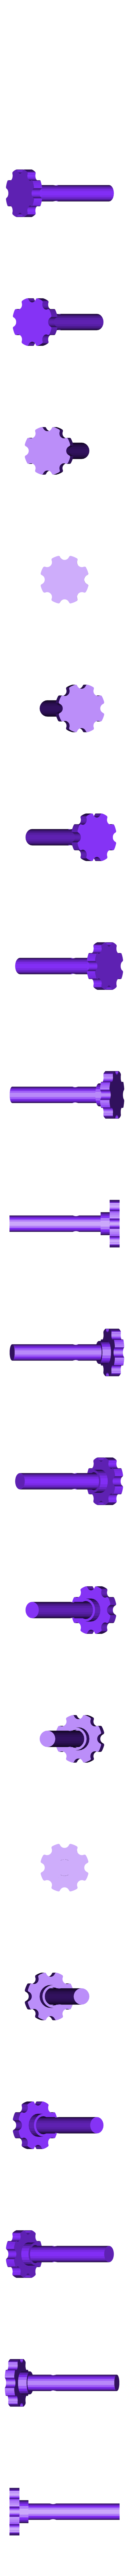 Load_Line_Motor.stl Download free STL file Mobile_Crane • Model to 3D print, alainritchieQ